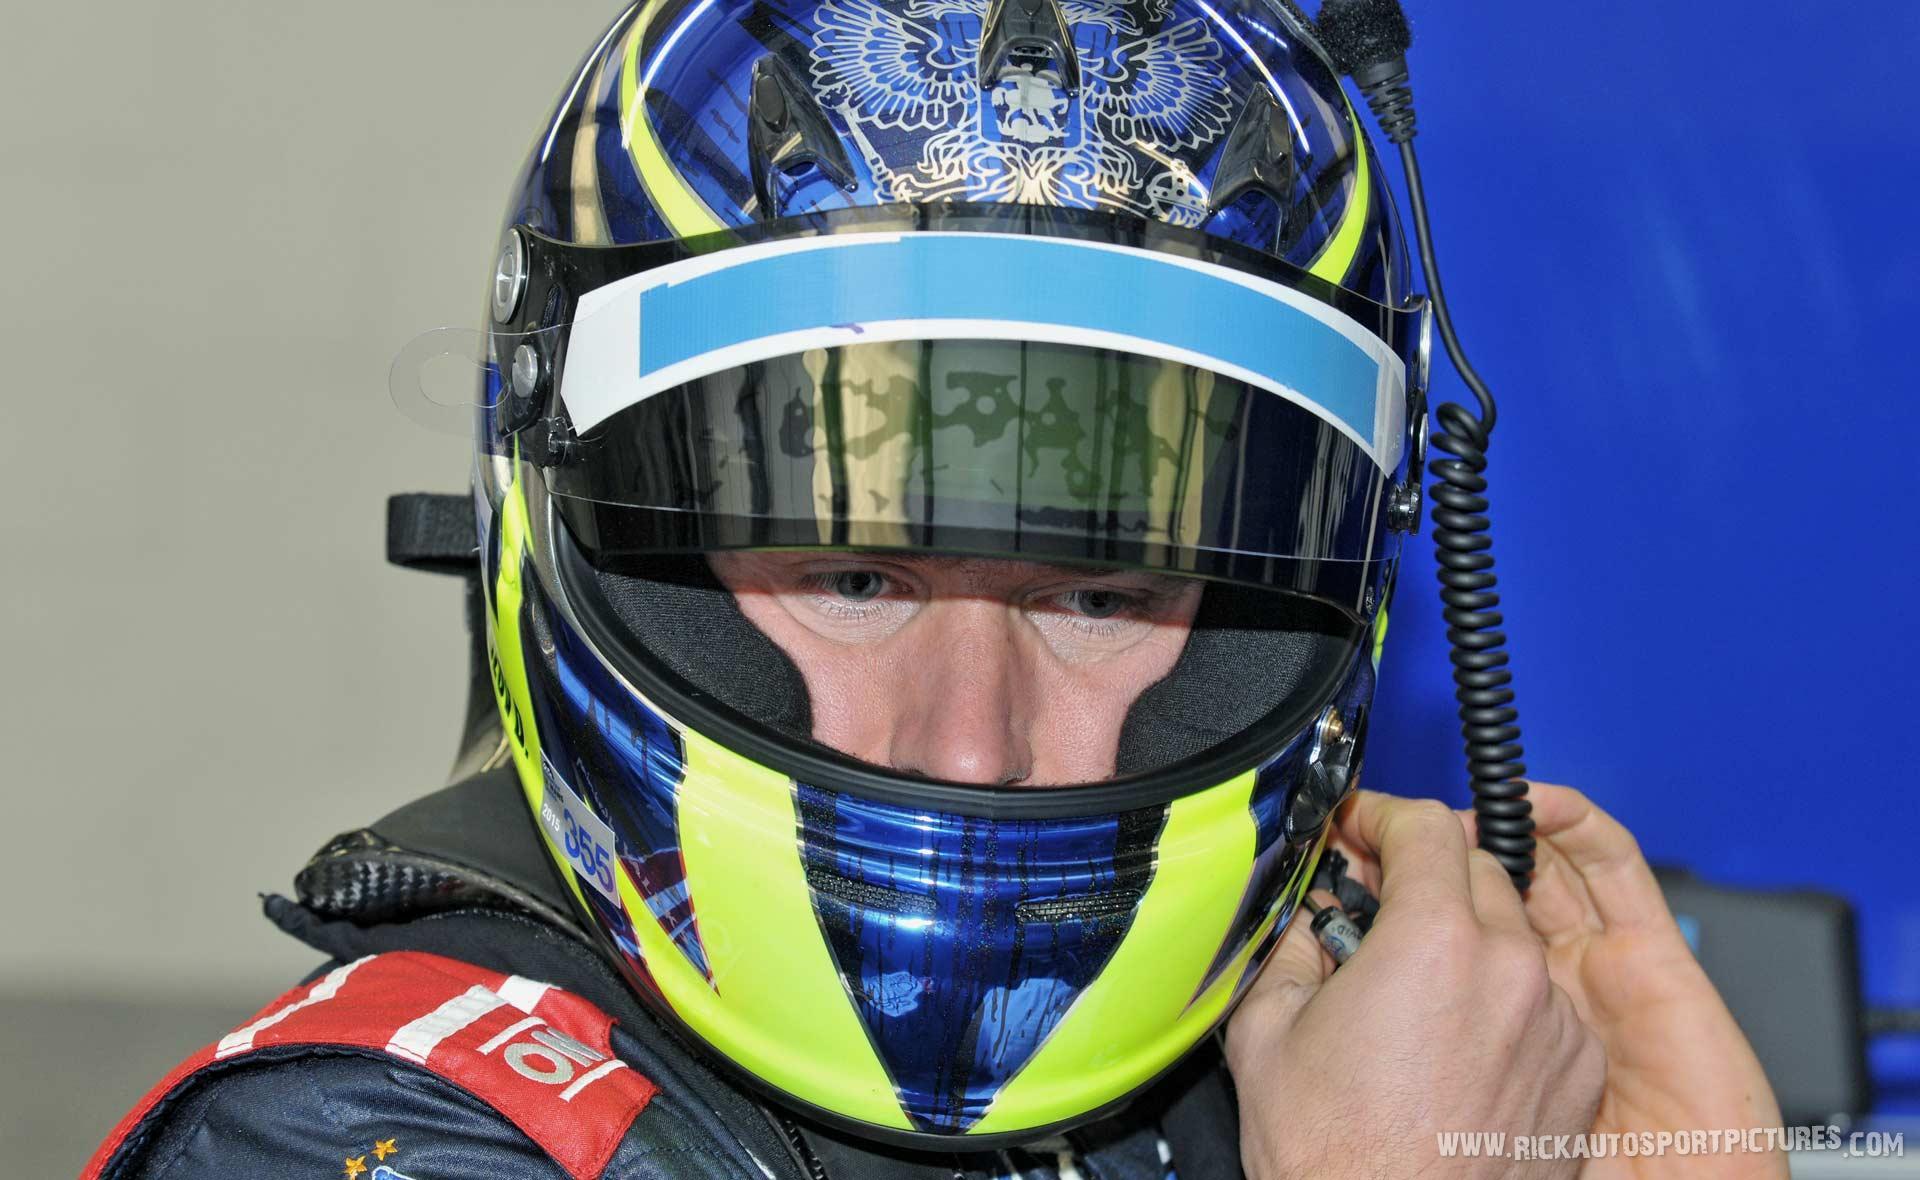 David Markozov Silverstone 2015